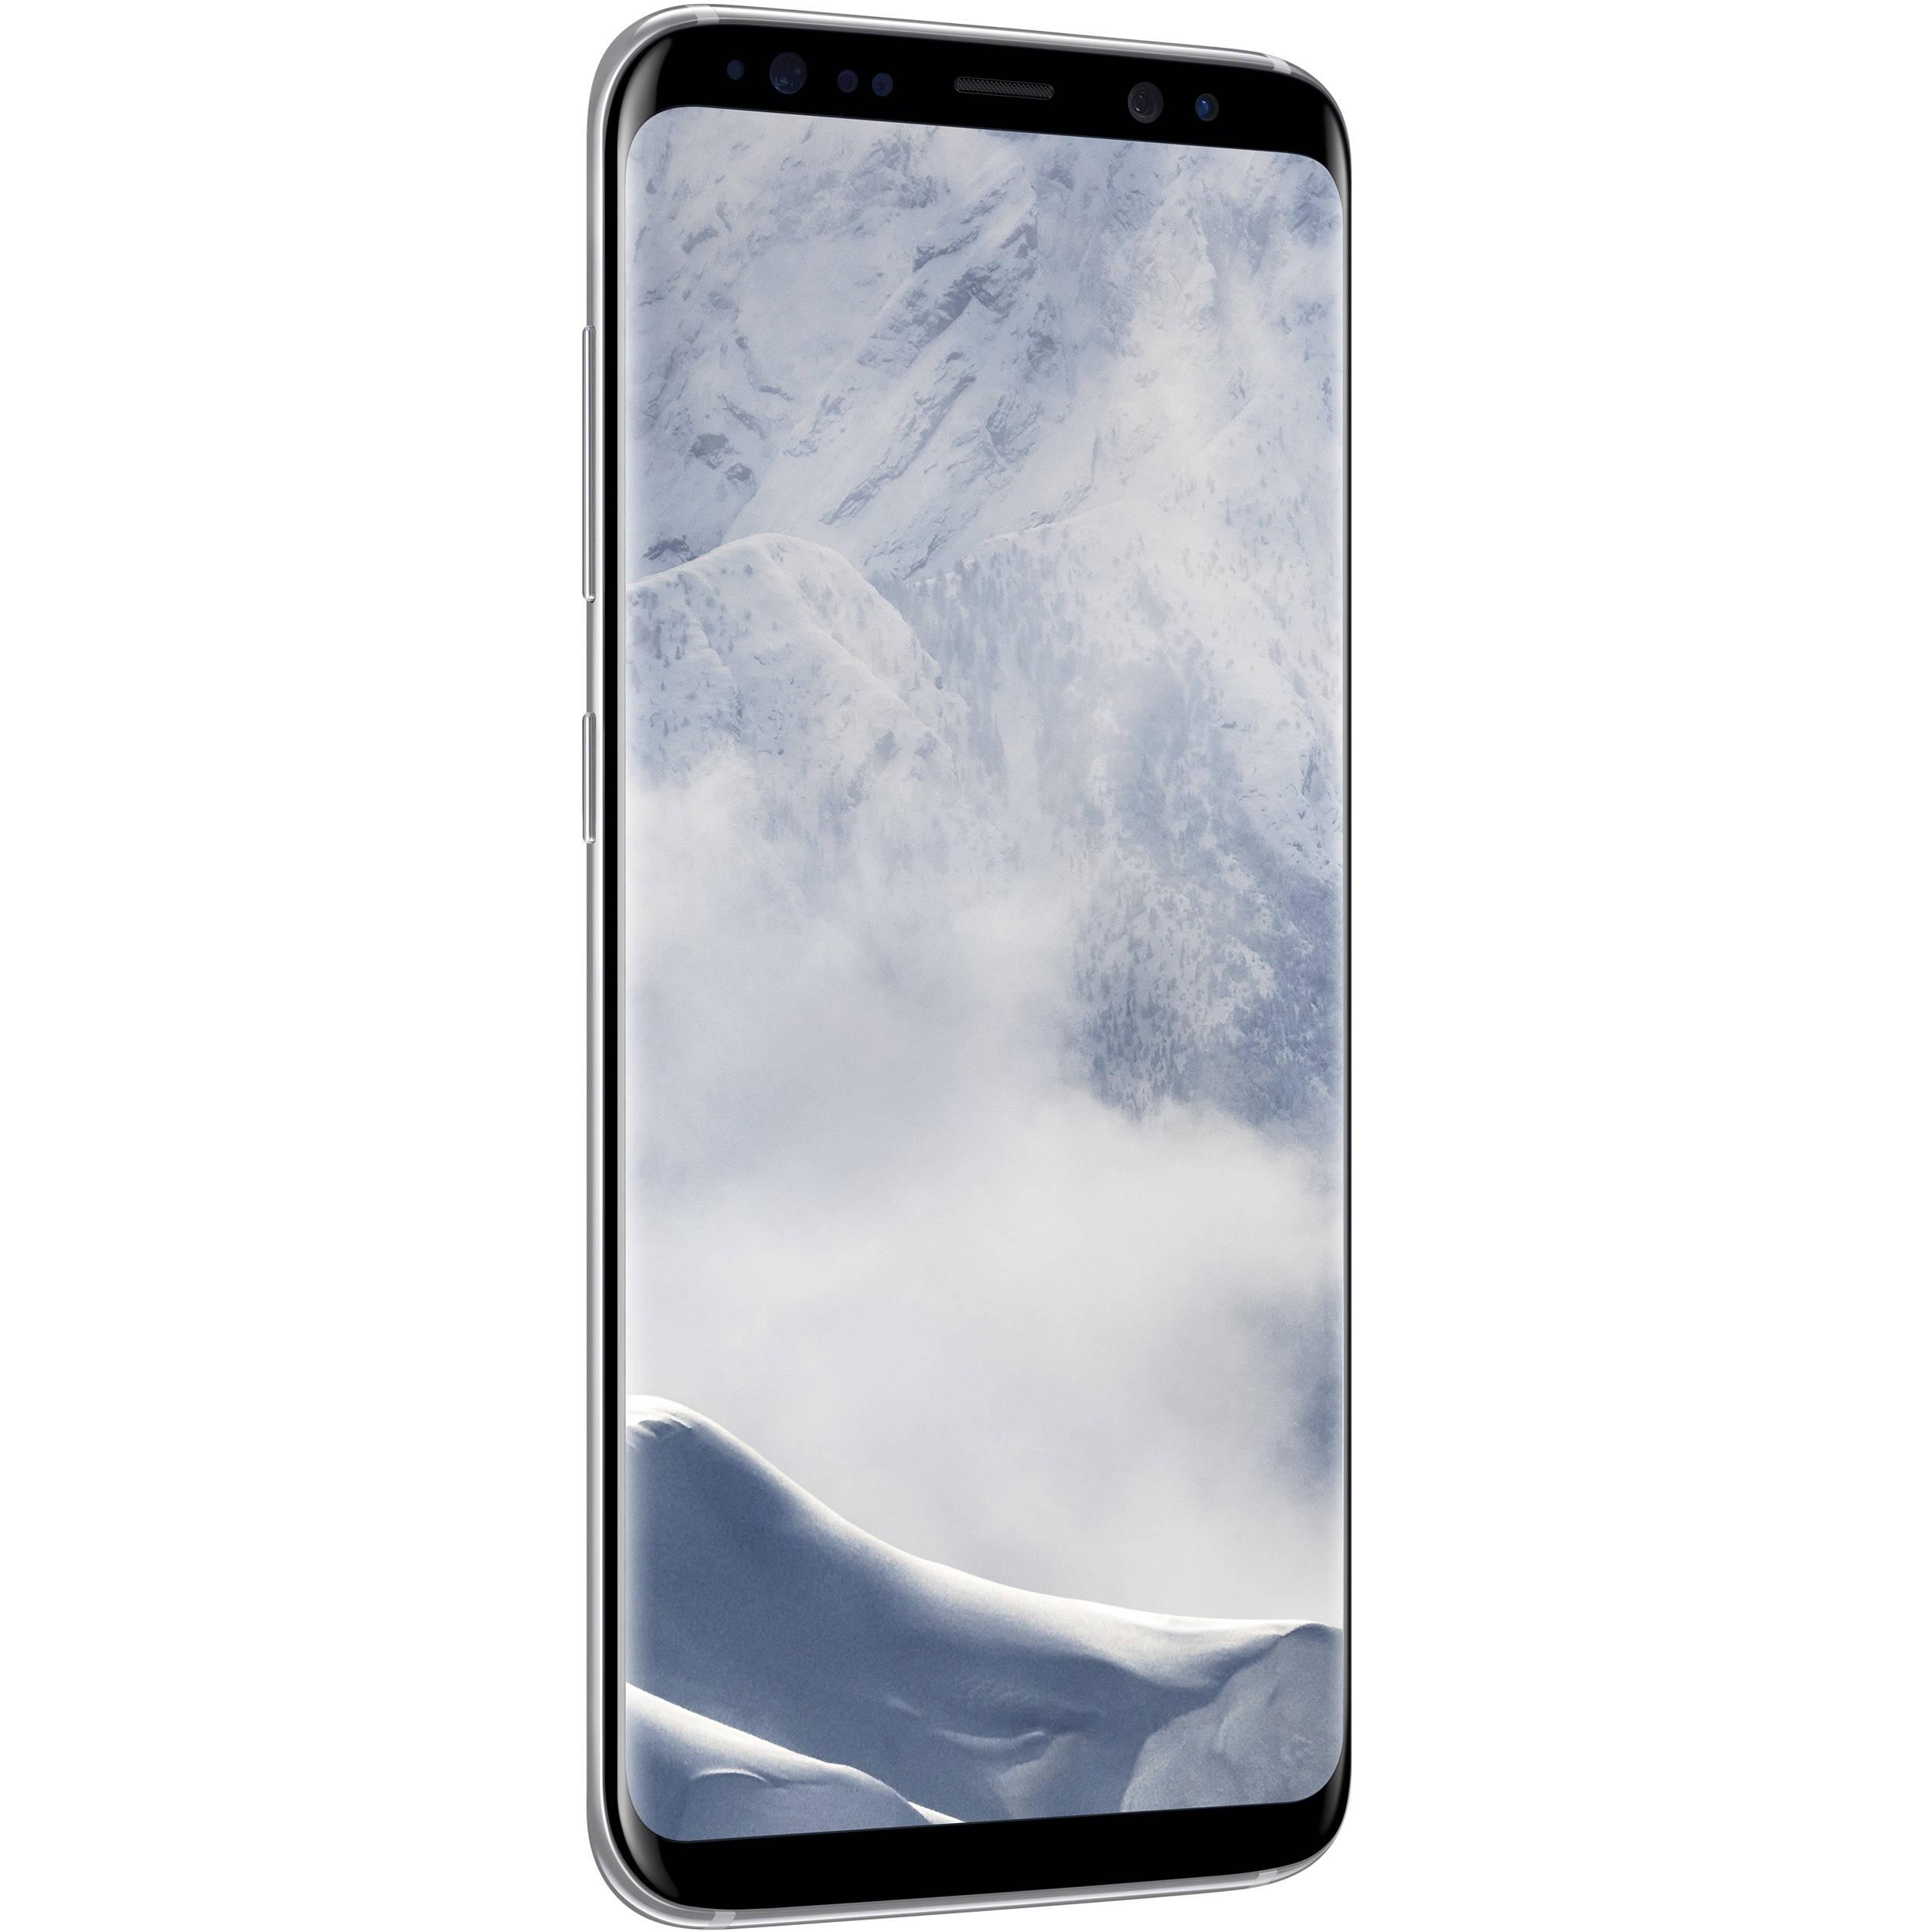 Samsung Galaxy S8 SM-G950U 64GB GSM Unlocked Android Smartphone